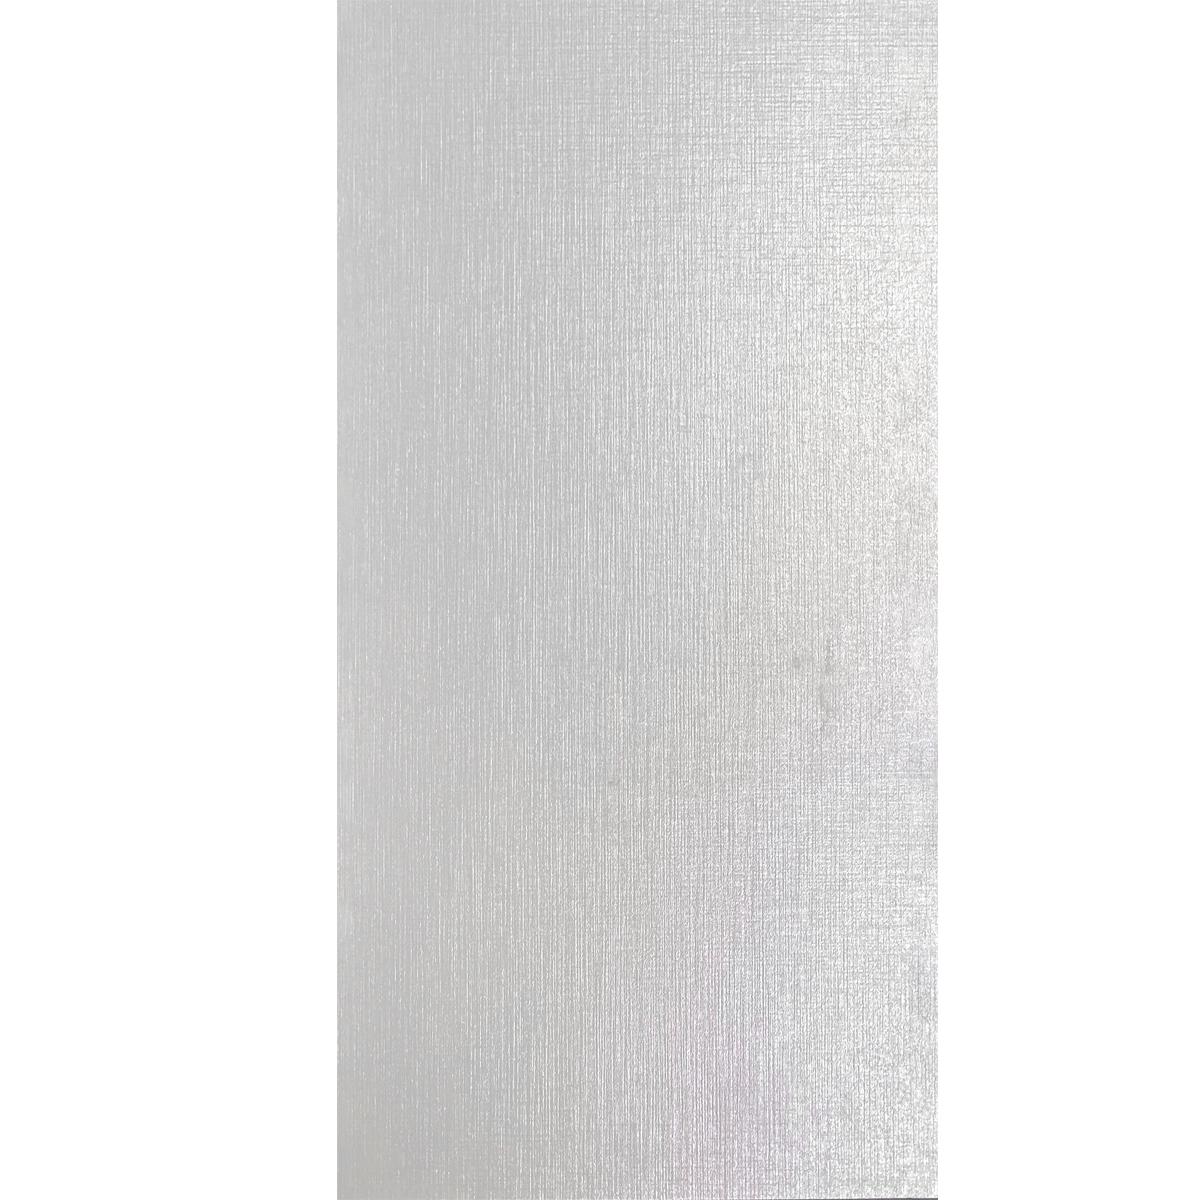 Nacar pure white decor 12x36 W00077